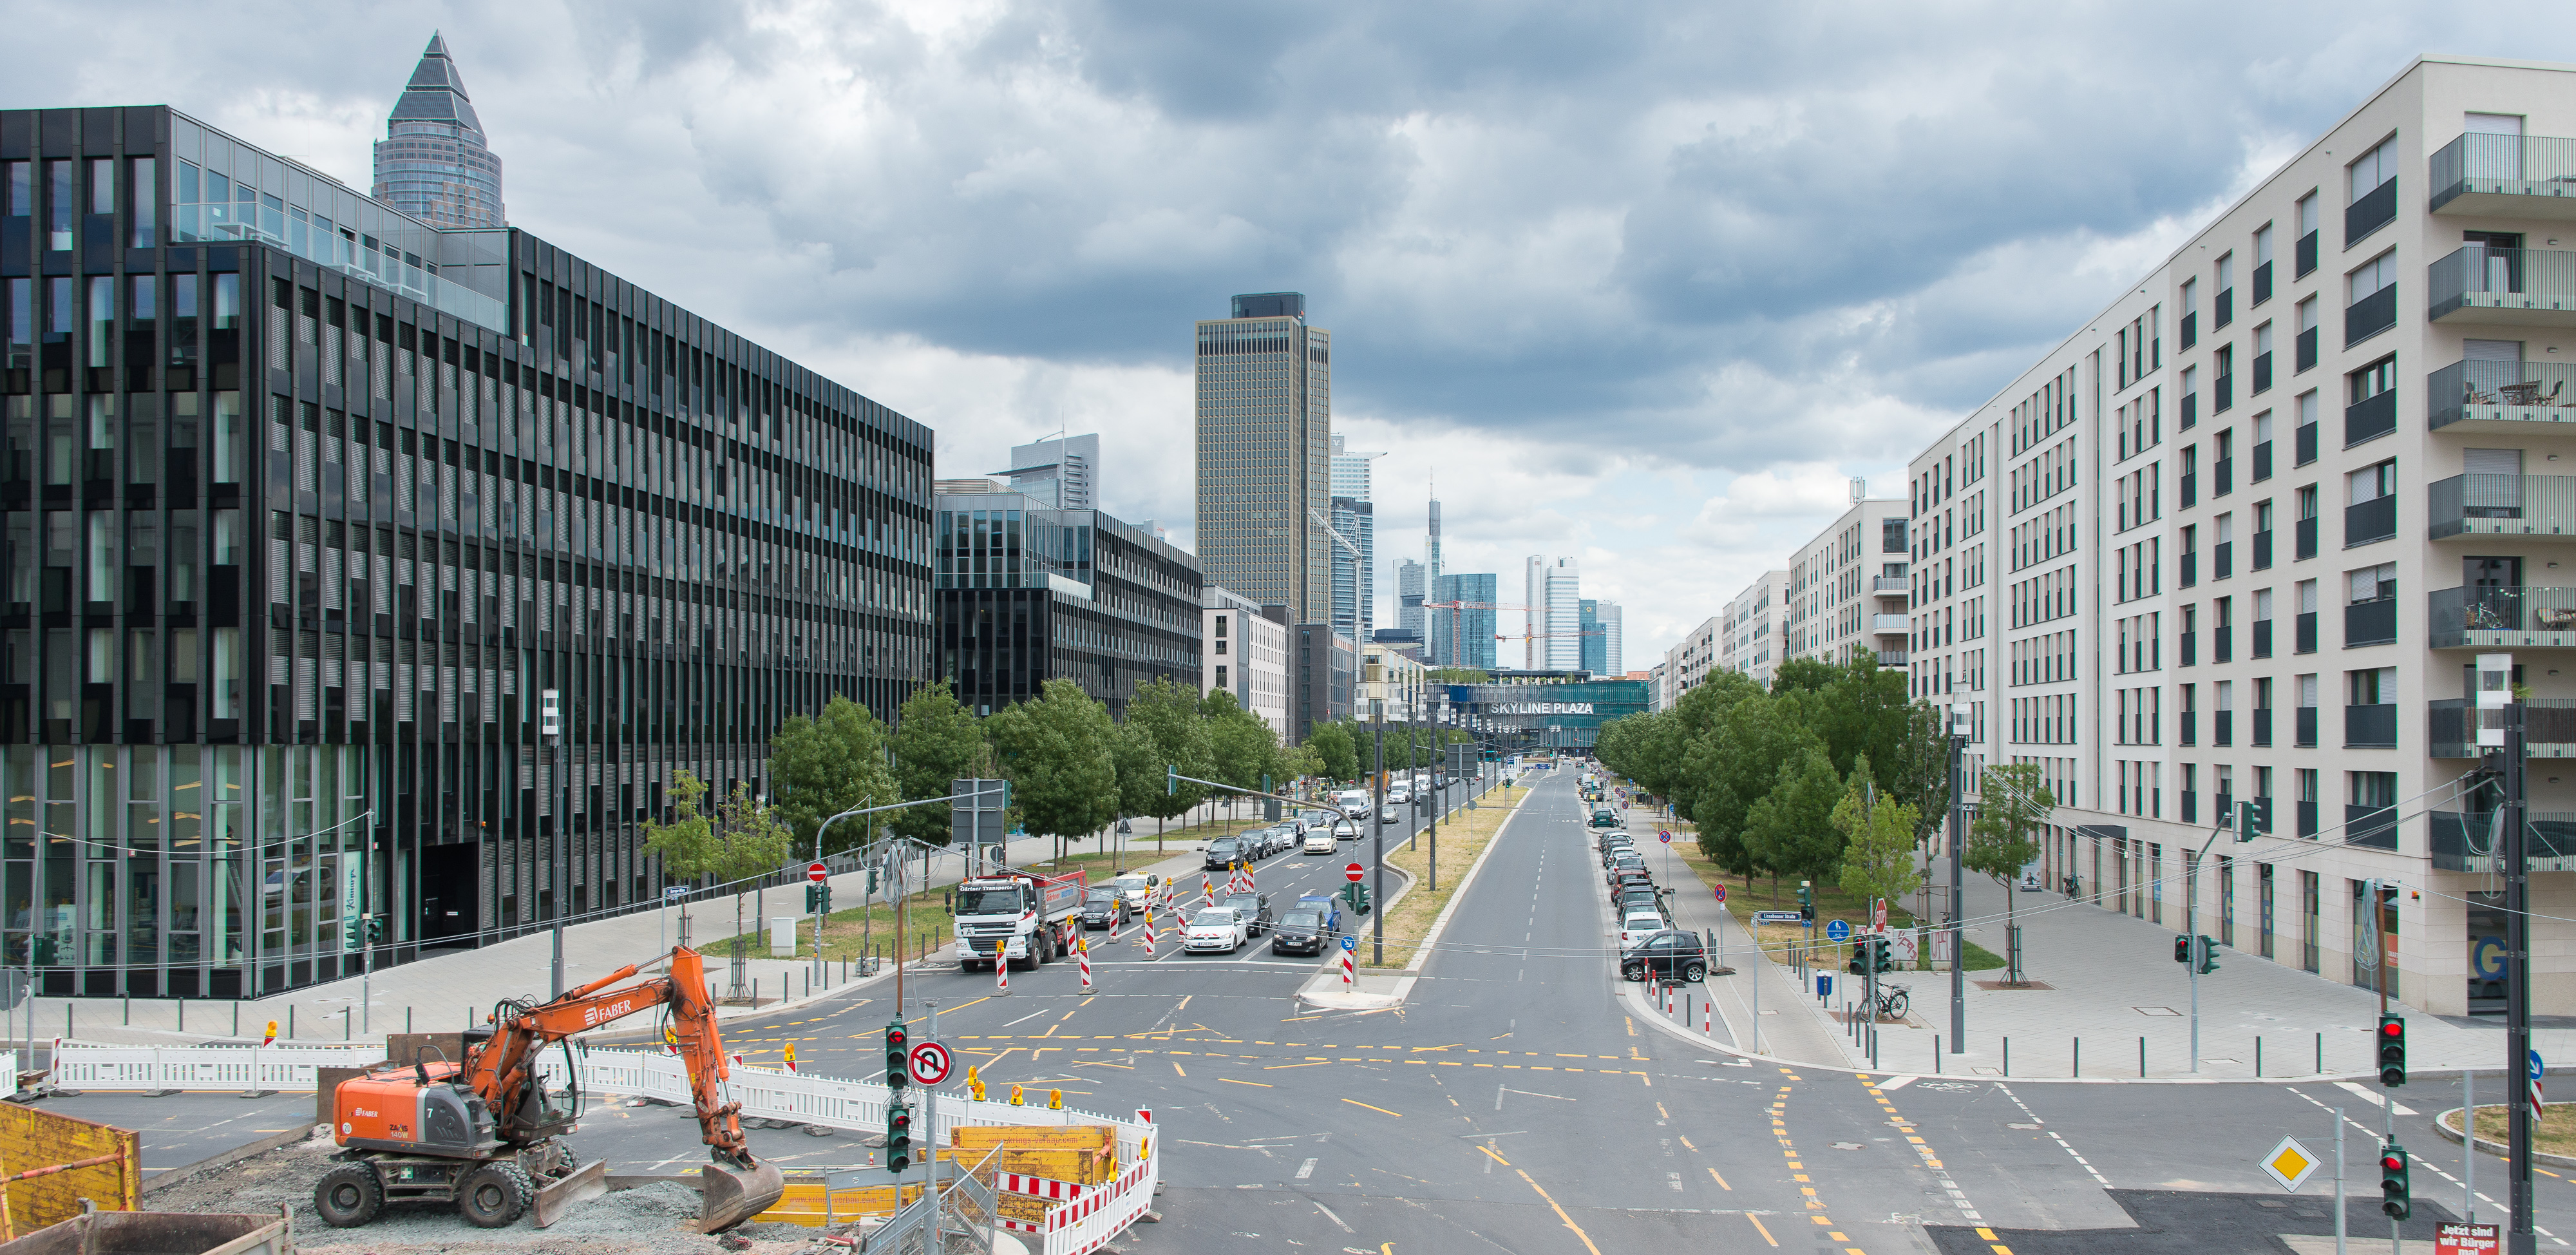 Hotel Frankfurt Hbf